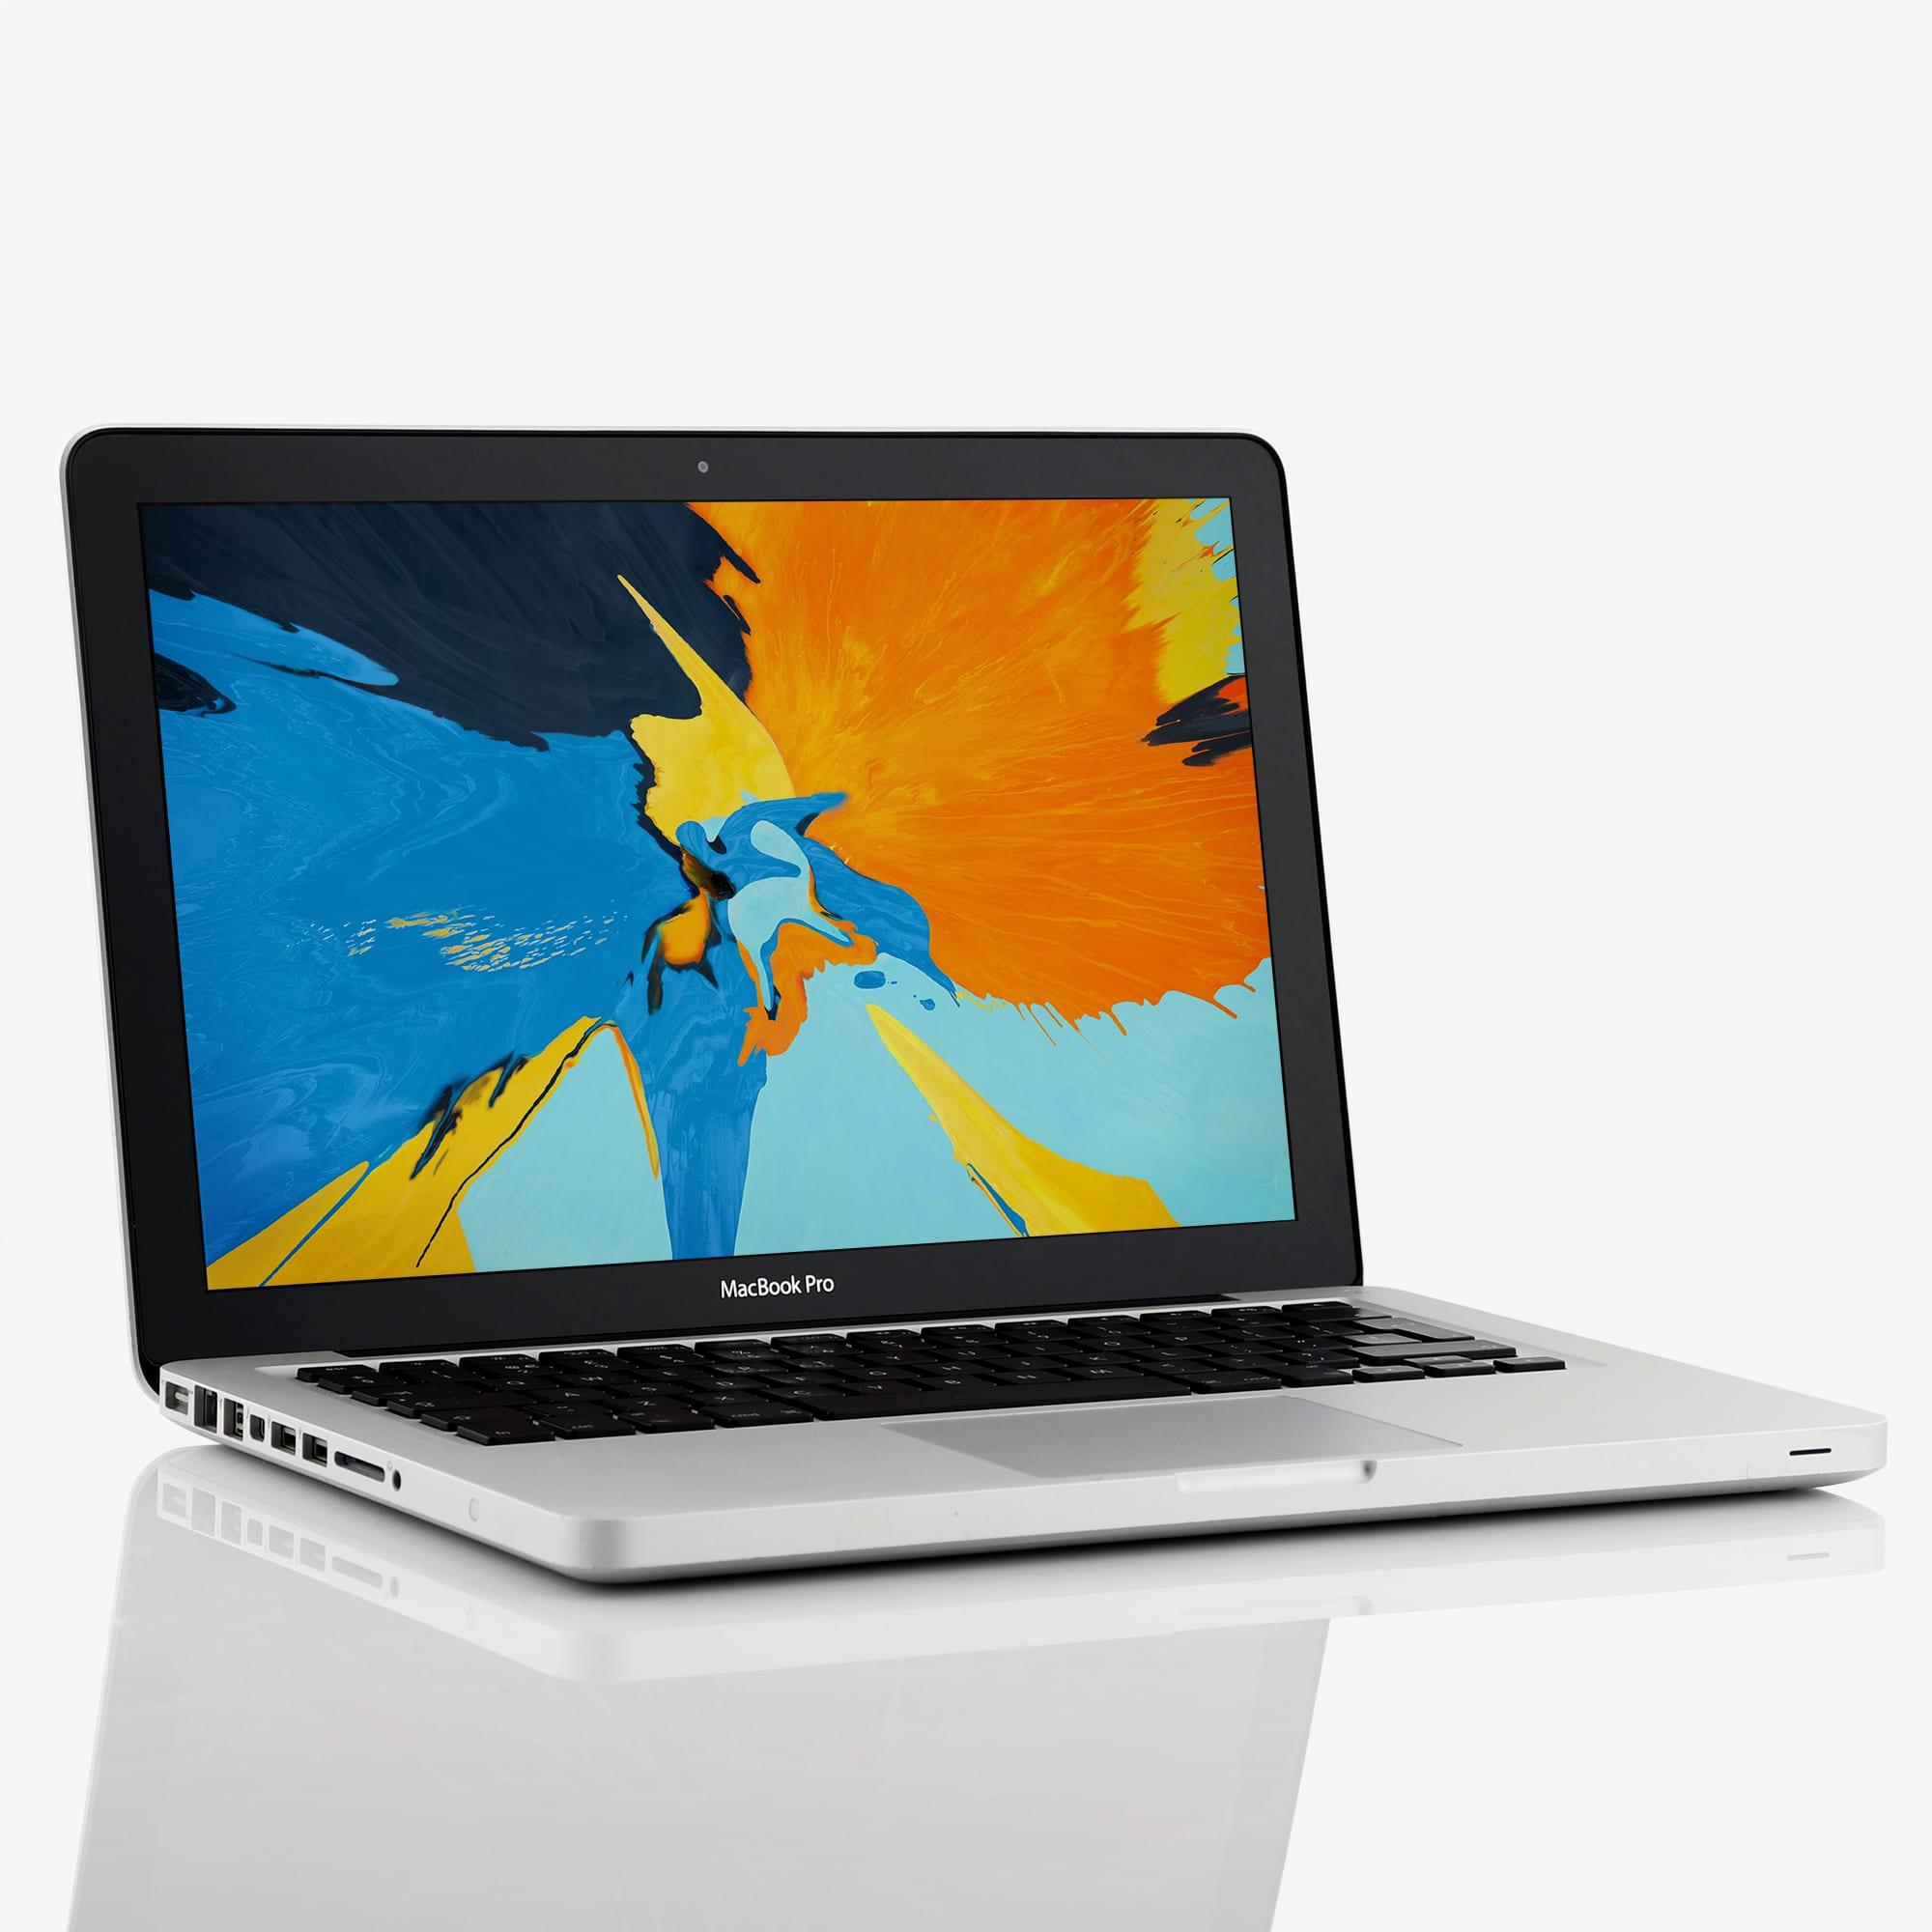 1 x Apple MacBook Pro 13 Inch Dual Core i5 2.50 GHz (2012)